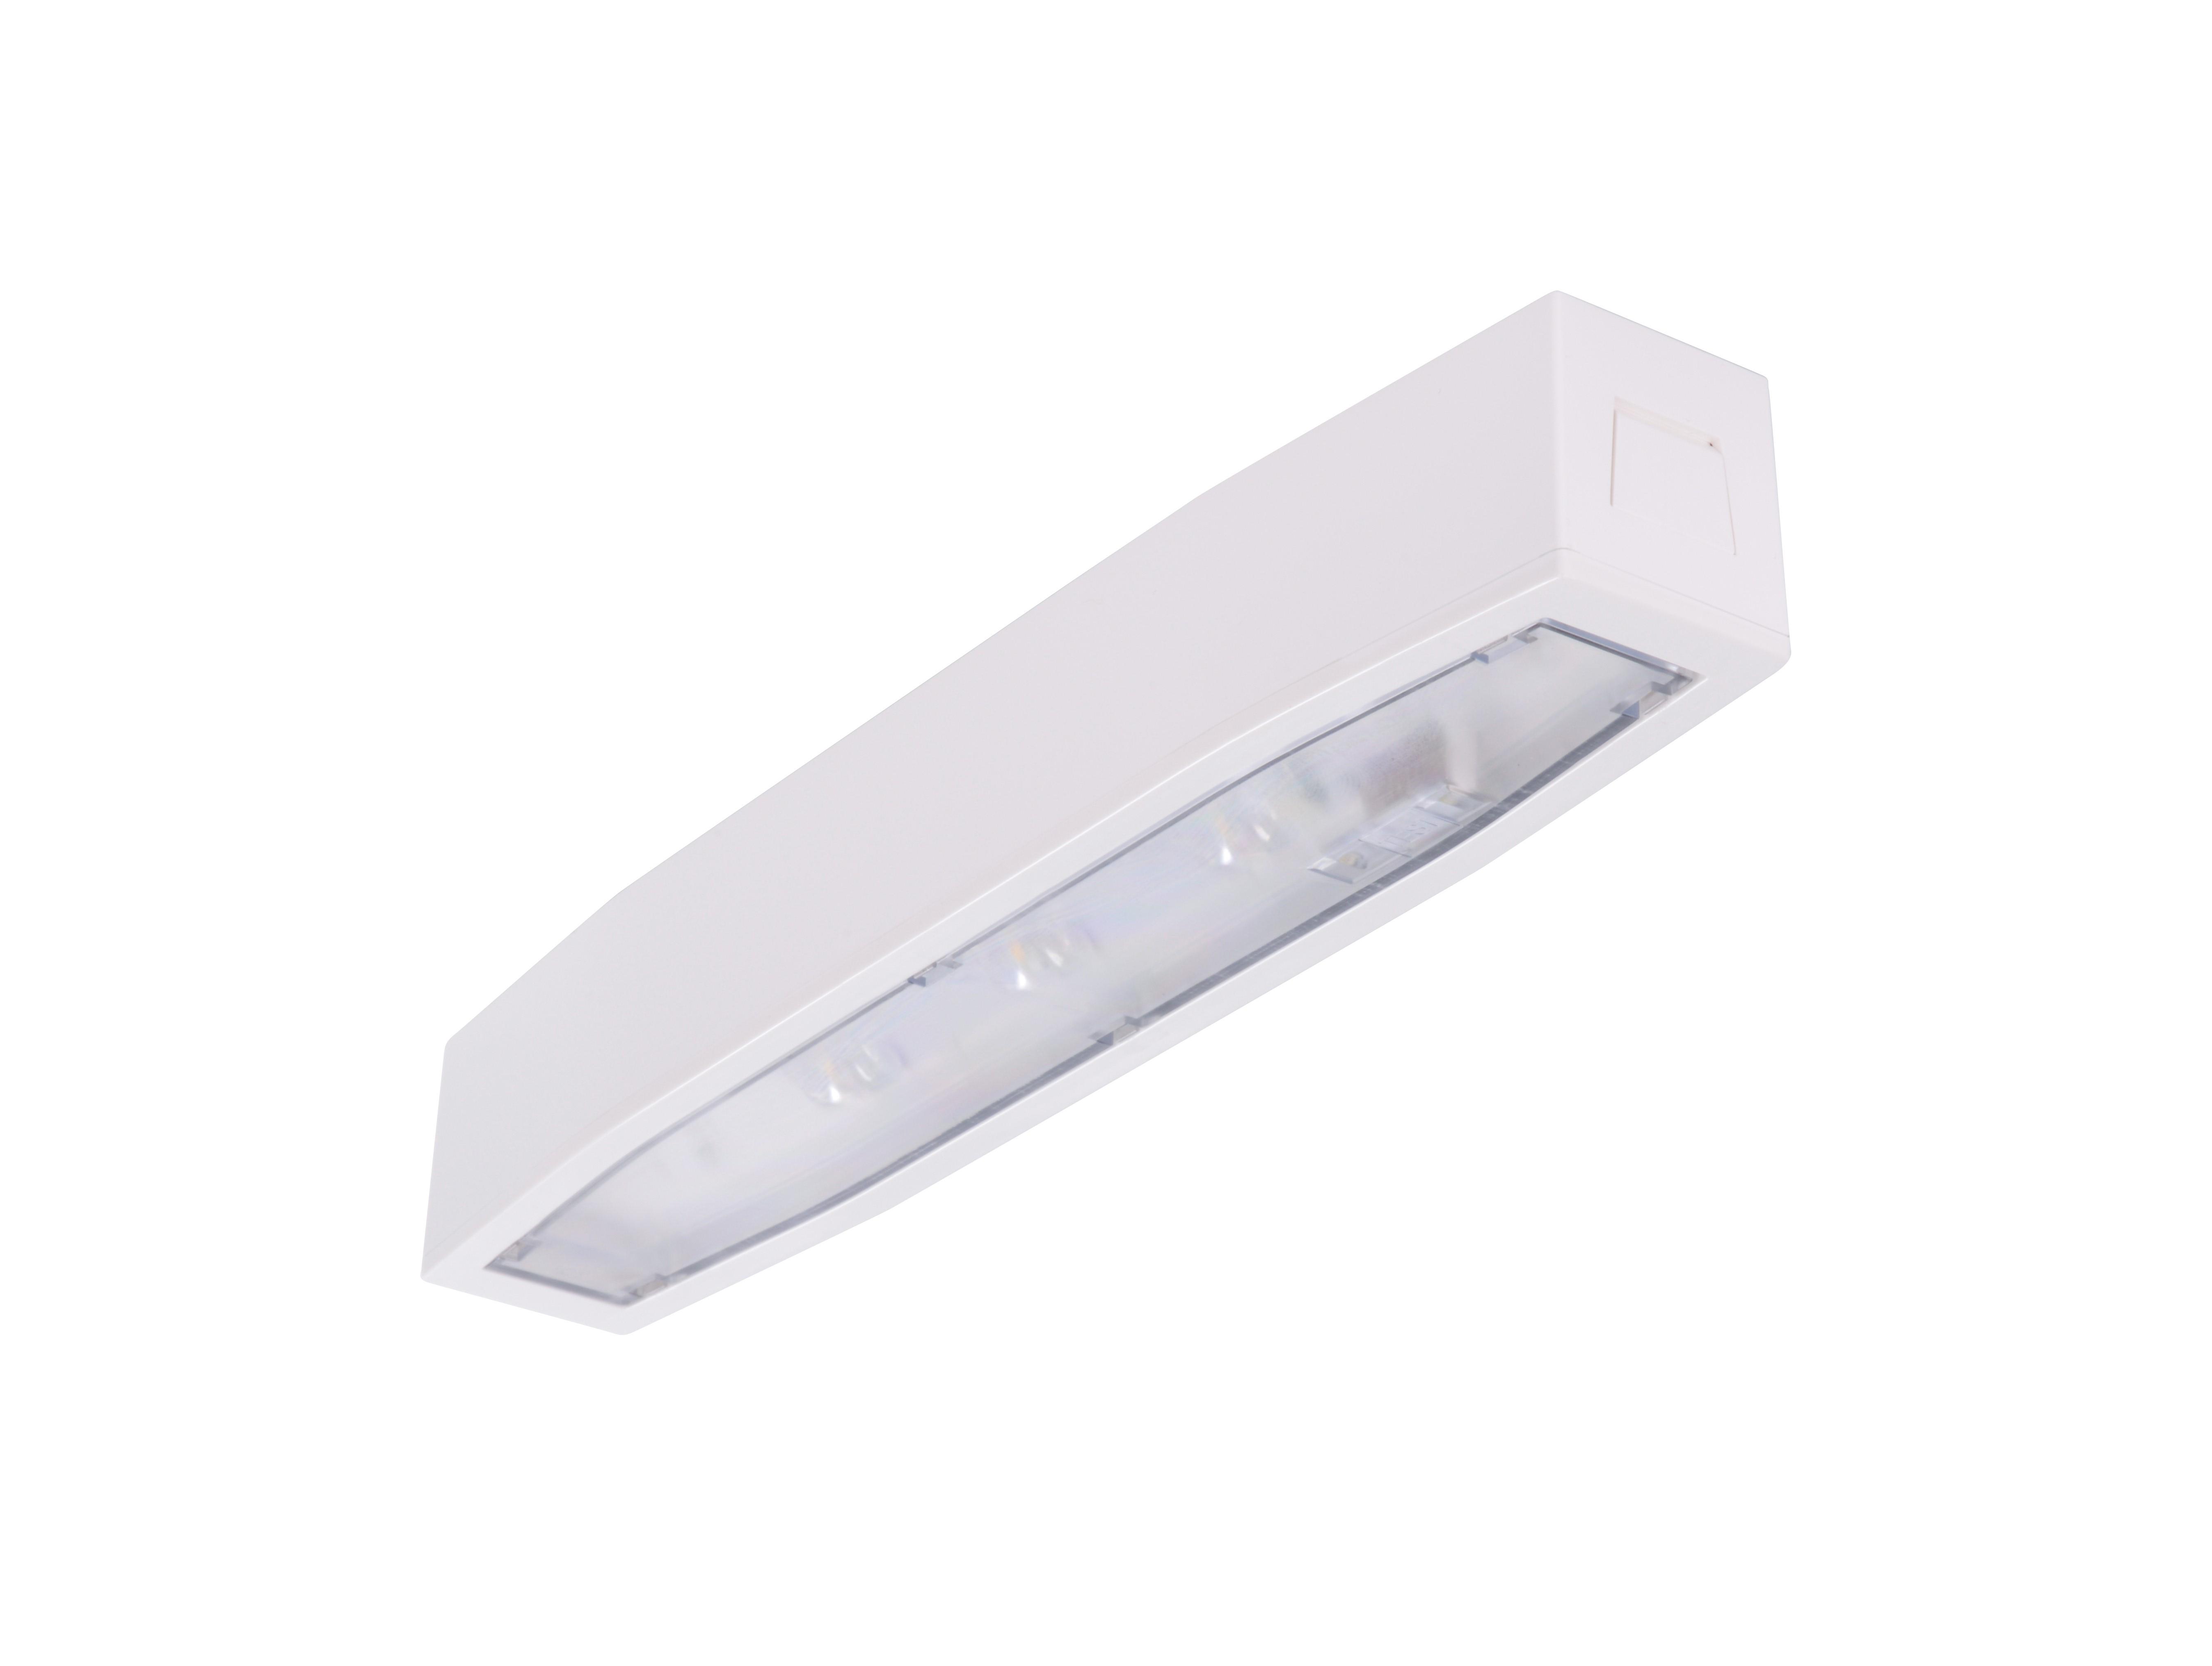 Lampa emergenta led Intelight 94764   3h mentinut test automat 0